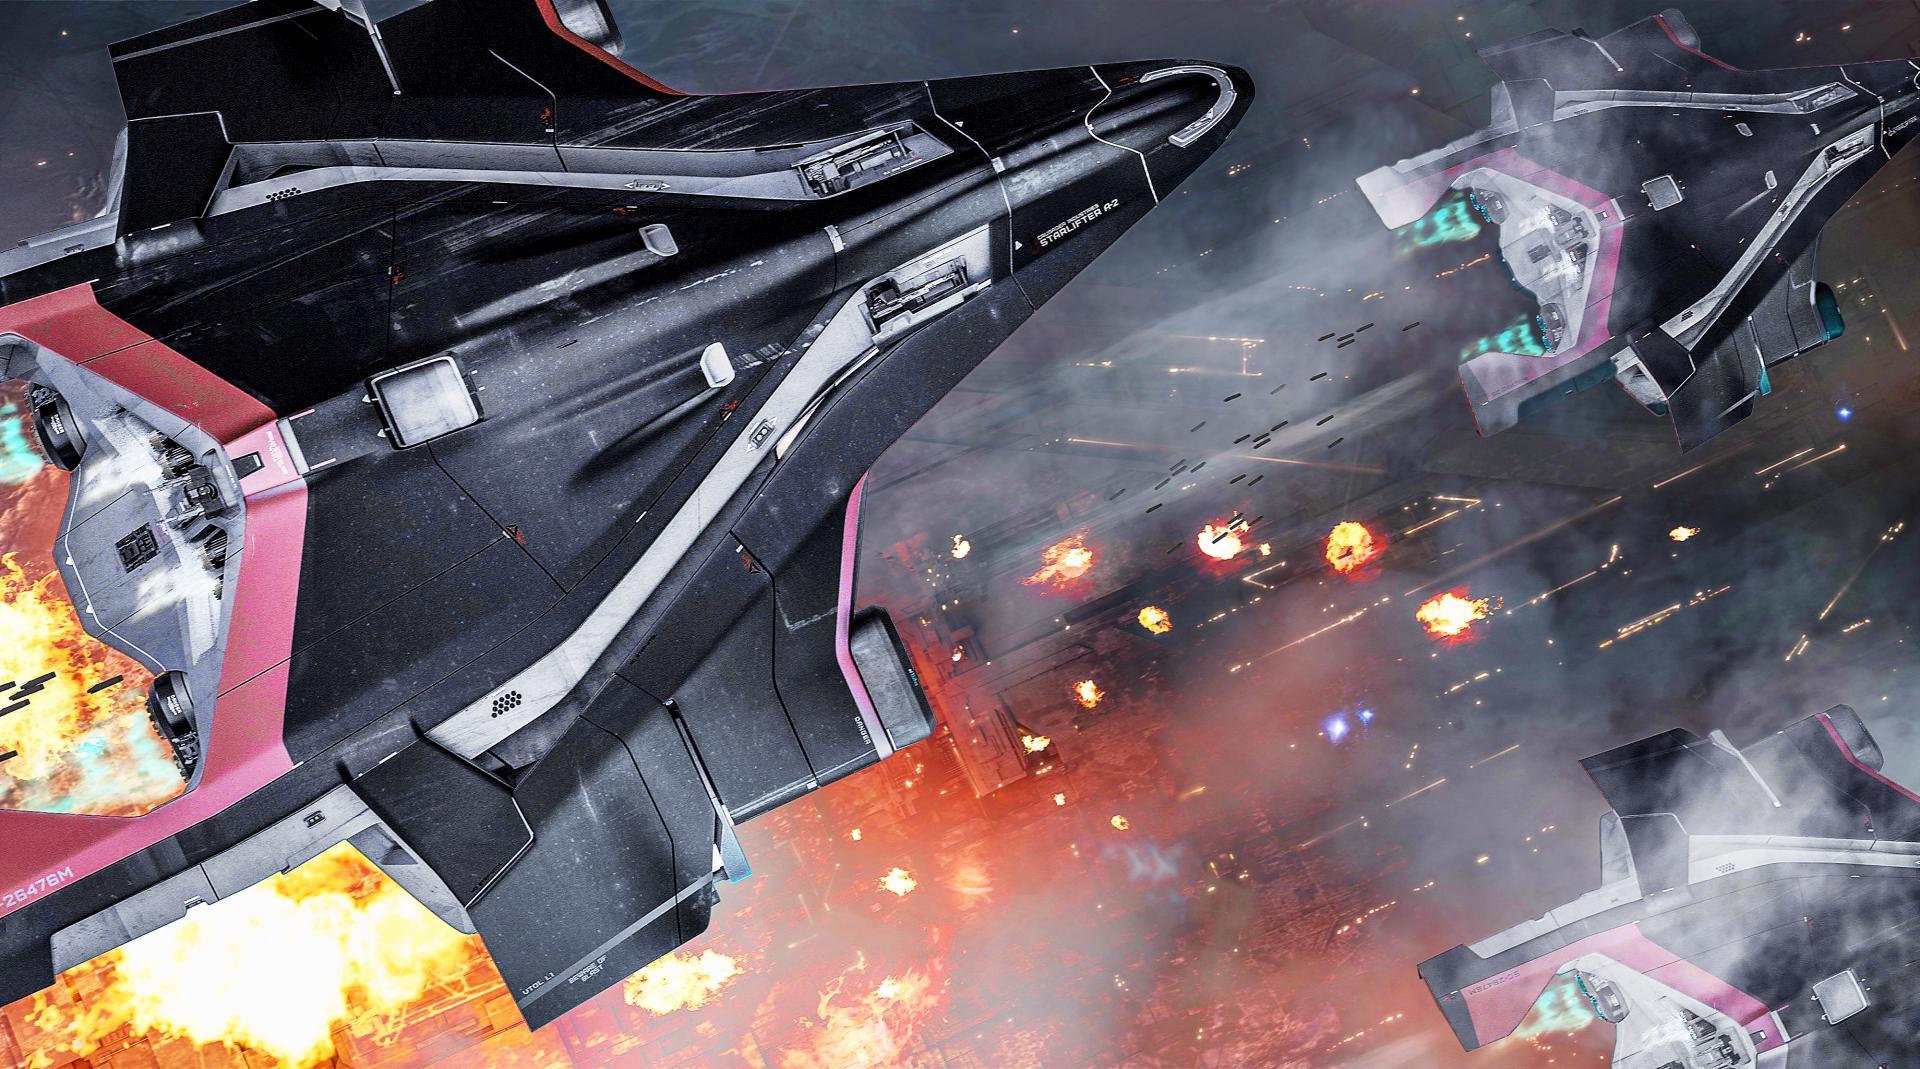 CRUS_Starlifter_Promo_Gunship_Bombing_MO02-Squashed (1).jpg